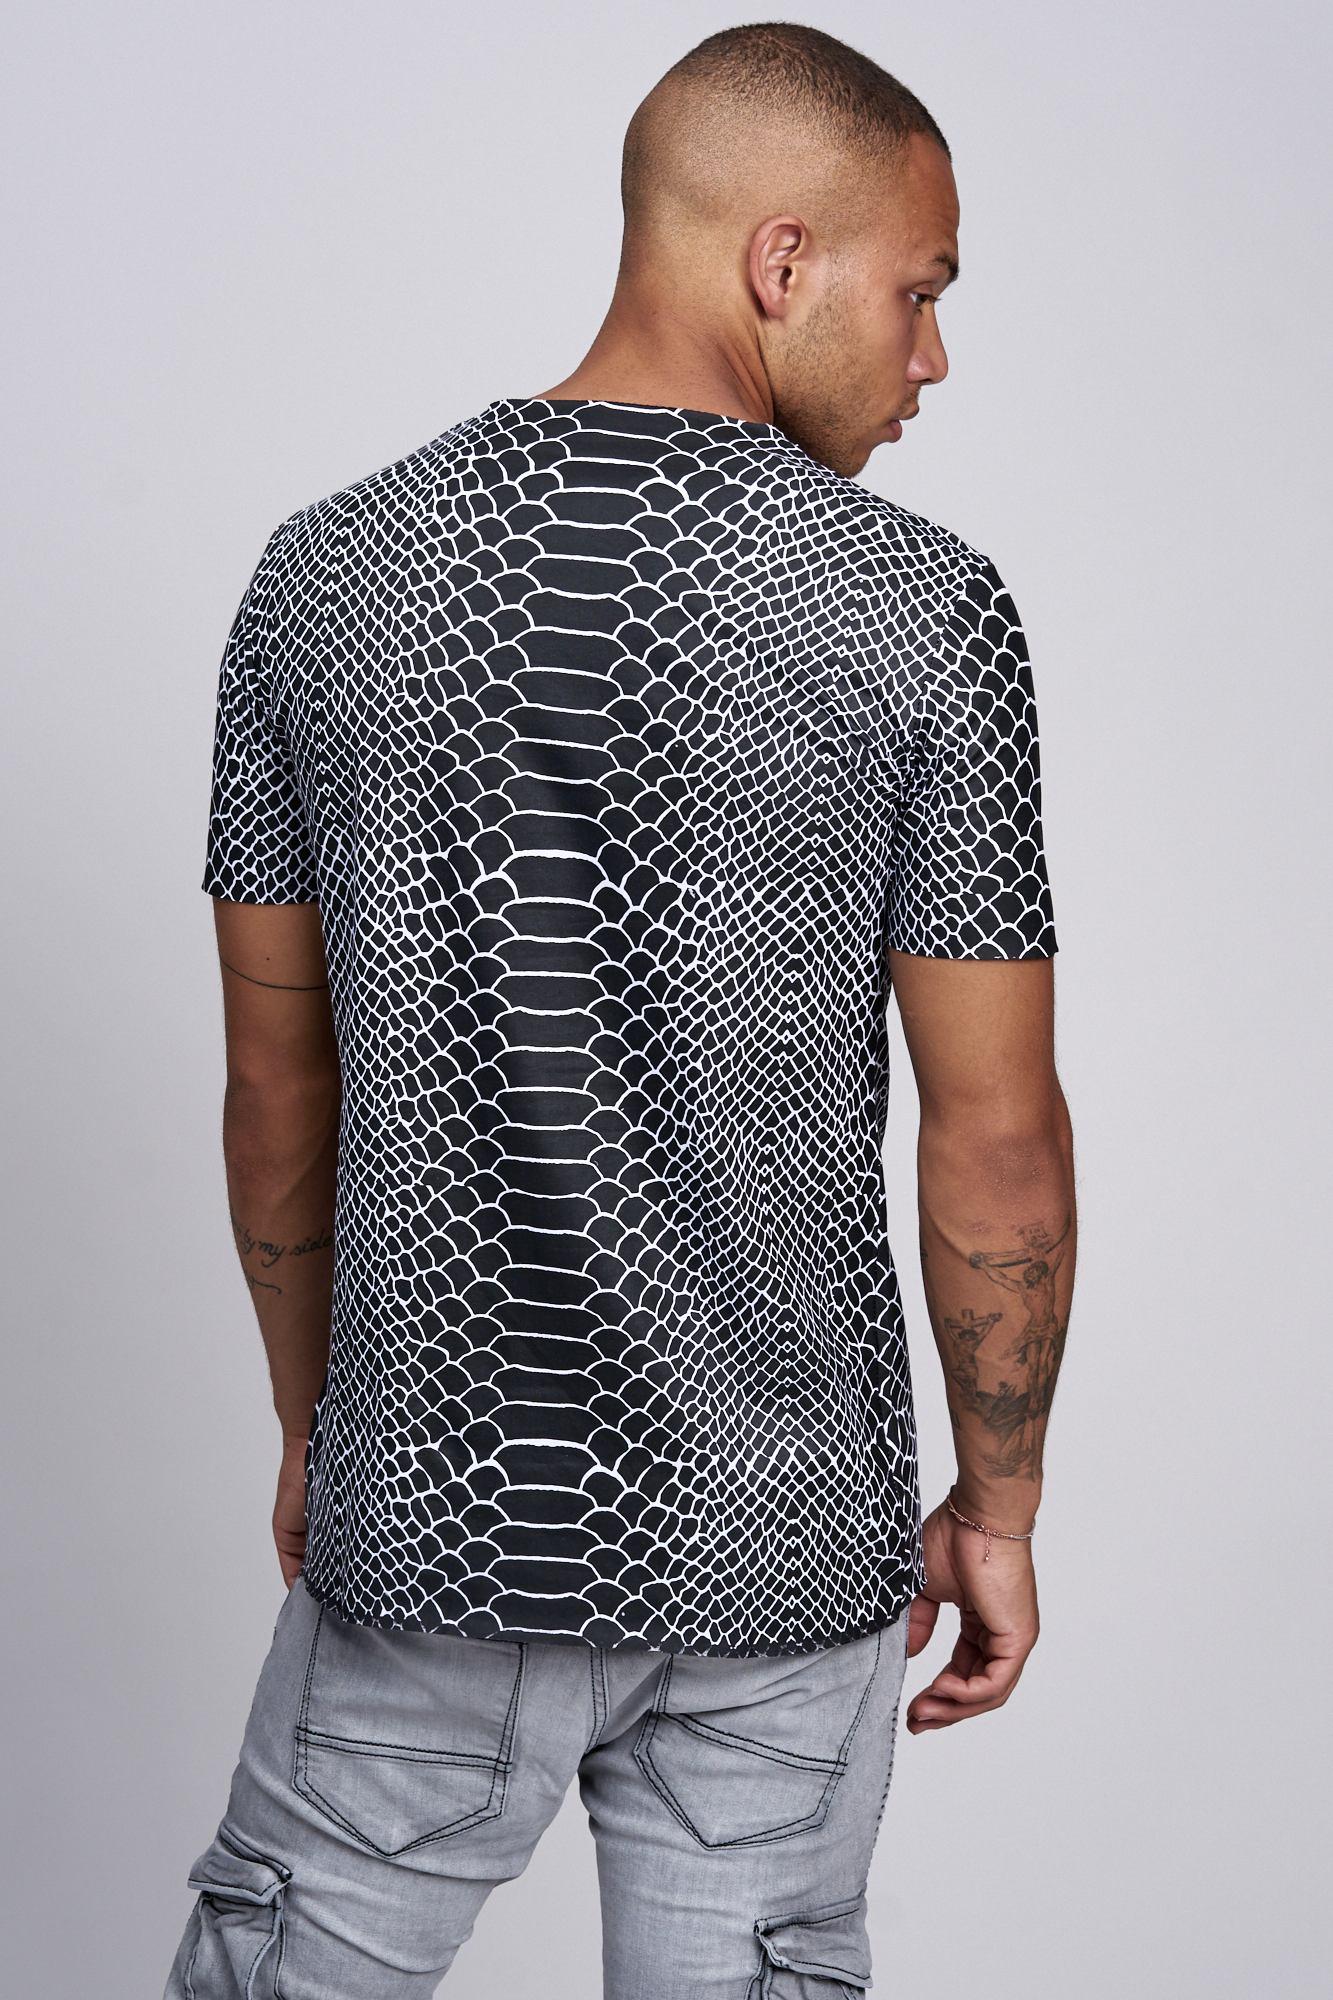 T-shirt-da-Uomo-Polo-Shirt-a-Maniche-Corte-printshirt-Polo-a-Maniche-Corte-17035-John-Kayna miniatura 13